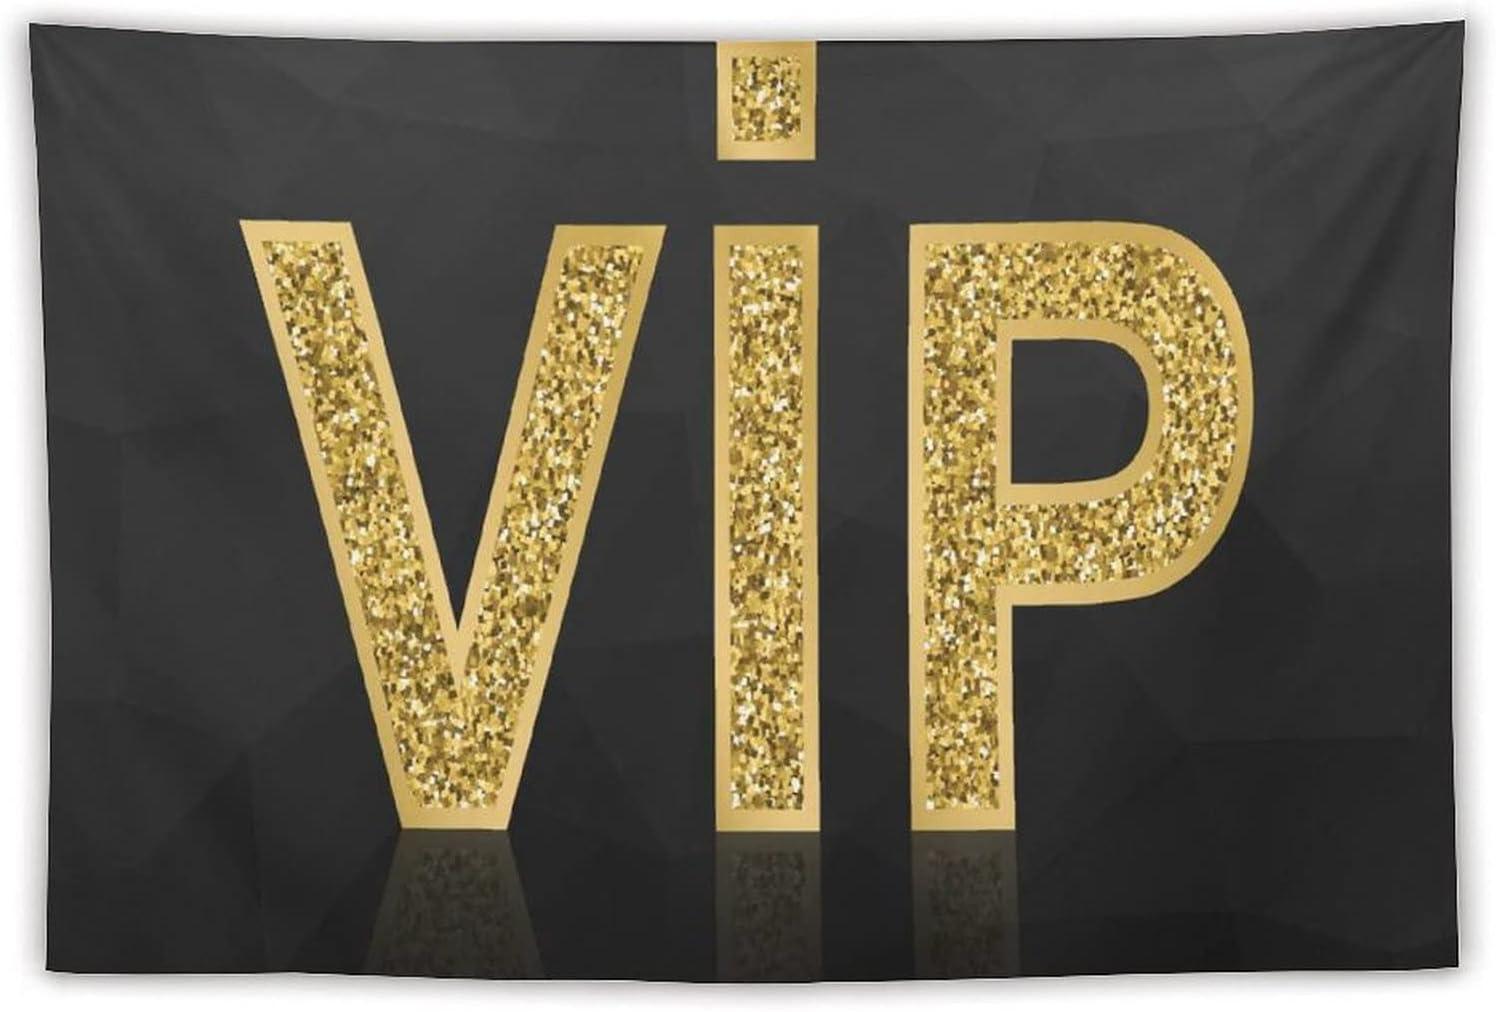 Manta Tapiz Para Colgar En Pared,VIP icono dorado brillante sobre fondo negro poligonal, Estera Picnic Decoración Sala Estar,40x60